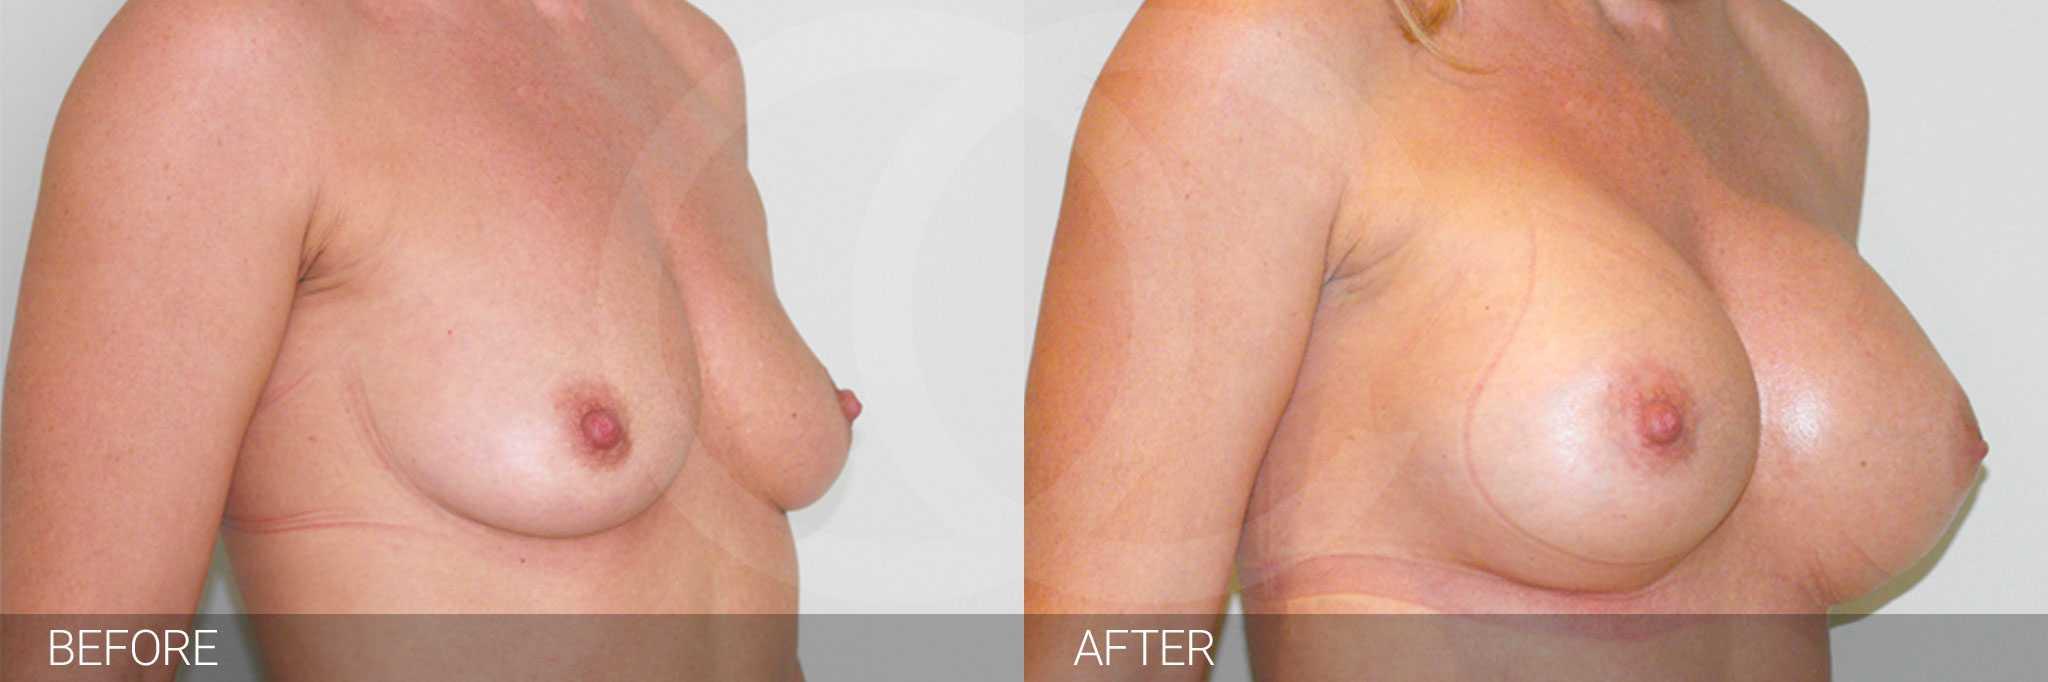 Brustvergrößerung Submuskuläre Implantatposition ante/post-op II